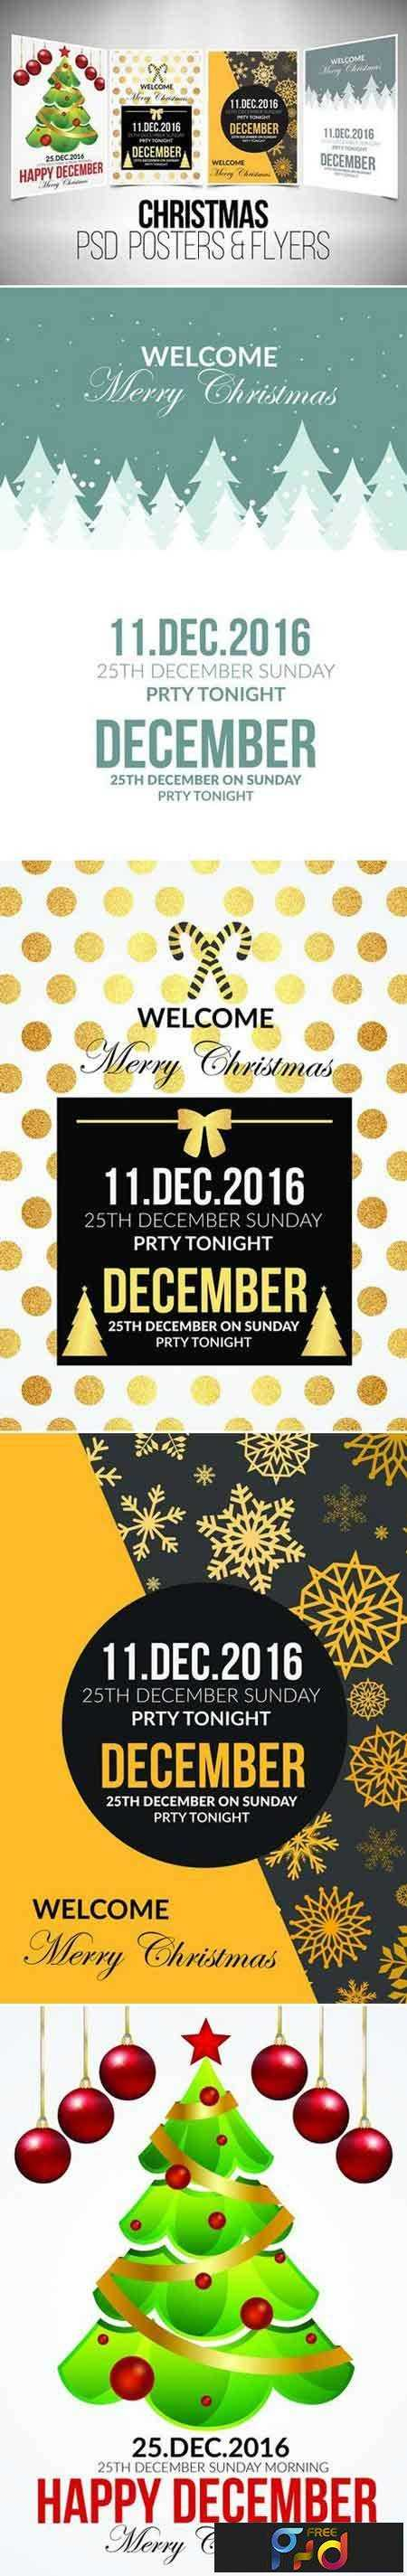 freepsdvn-com_1480642287_4-christmas-flyer-template-bundle-937212